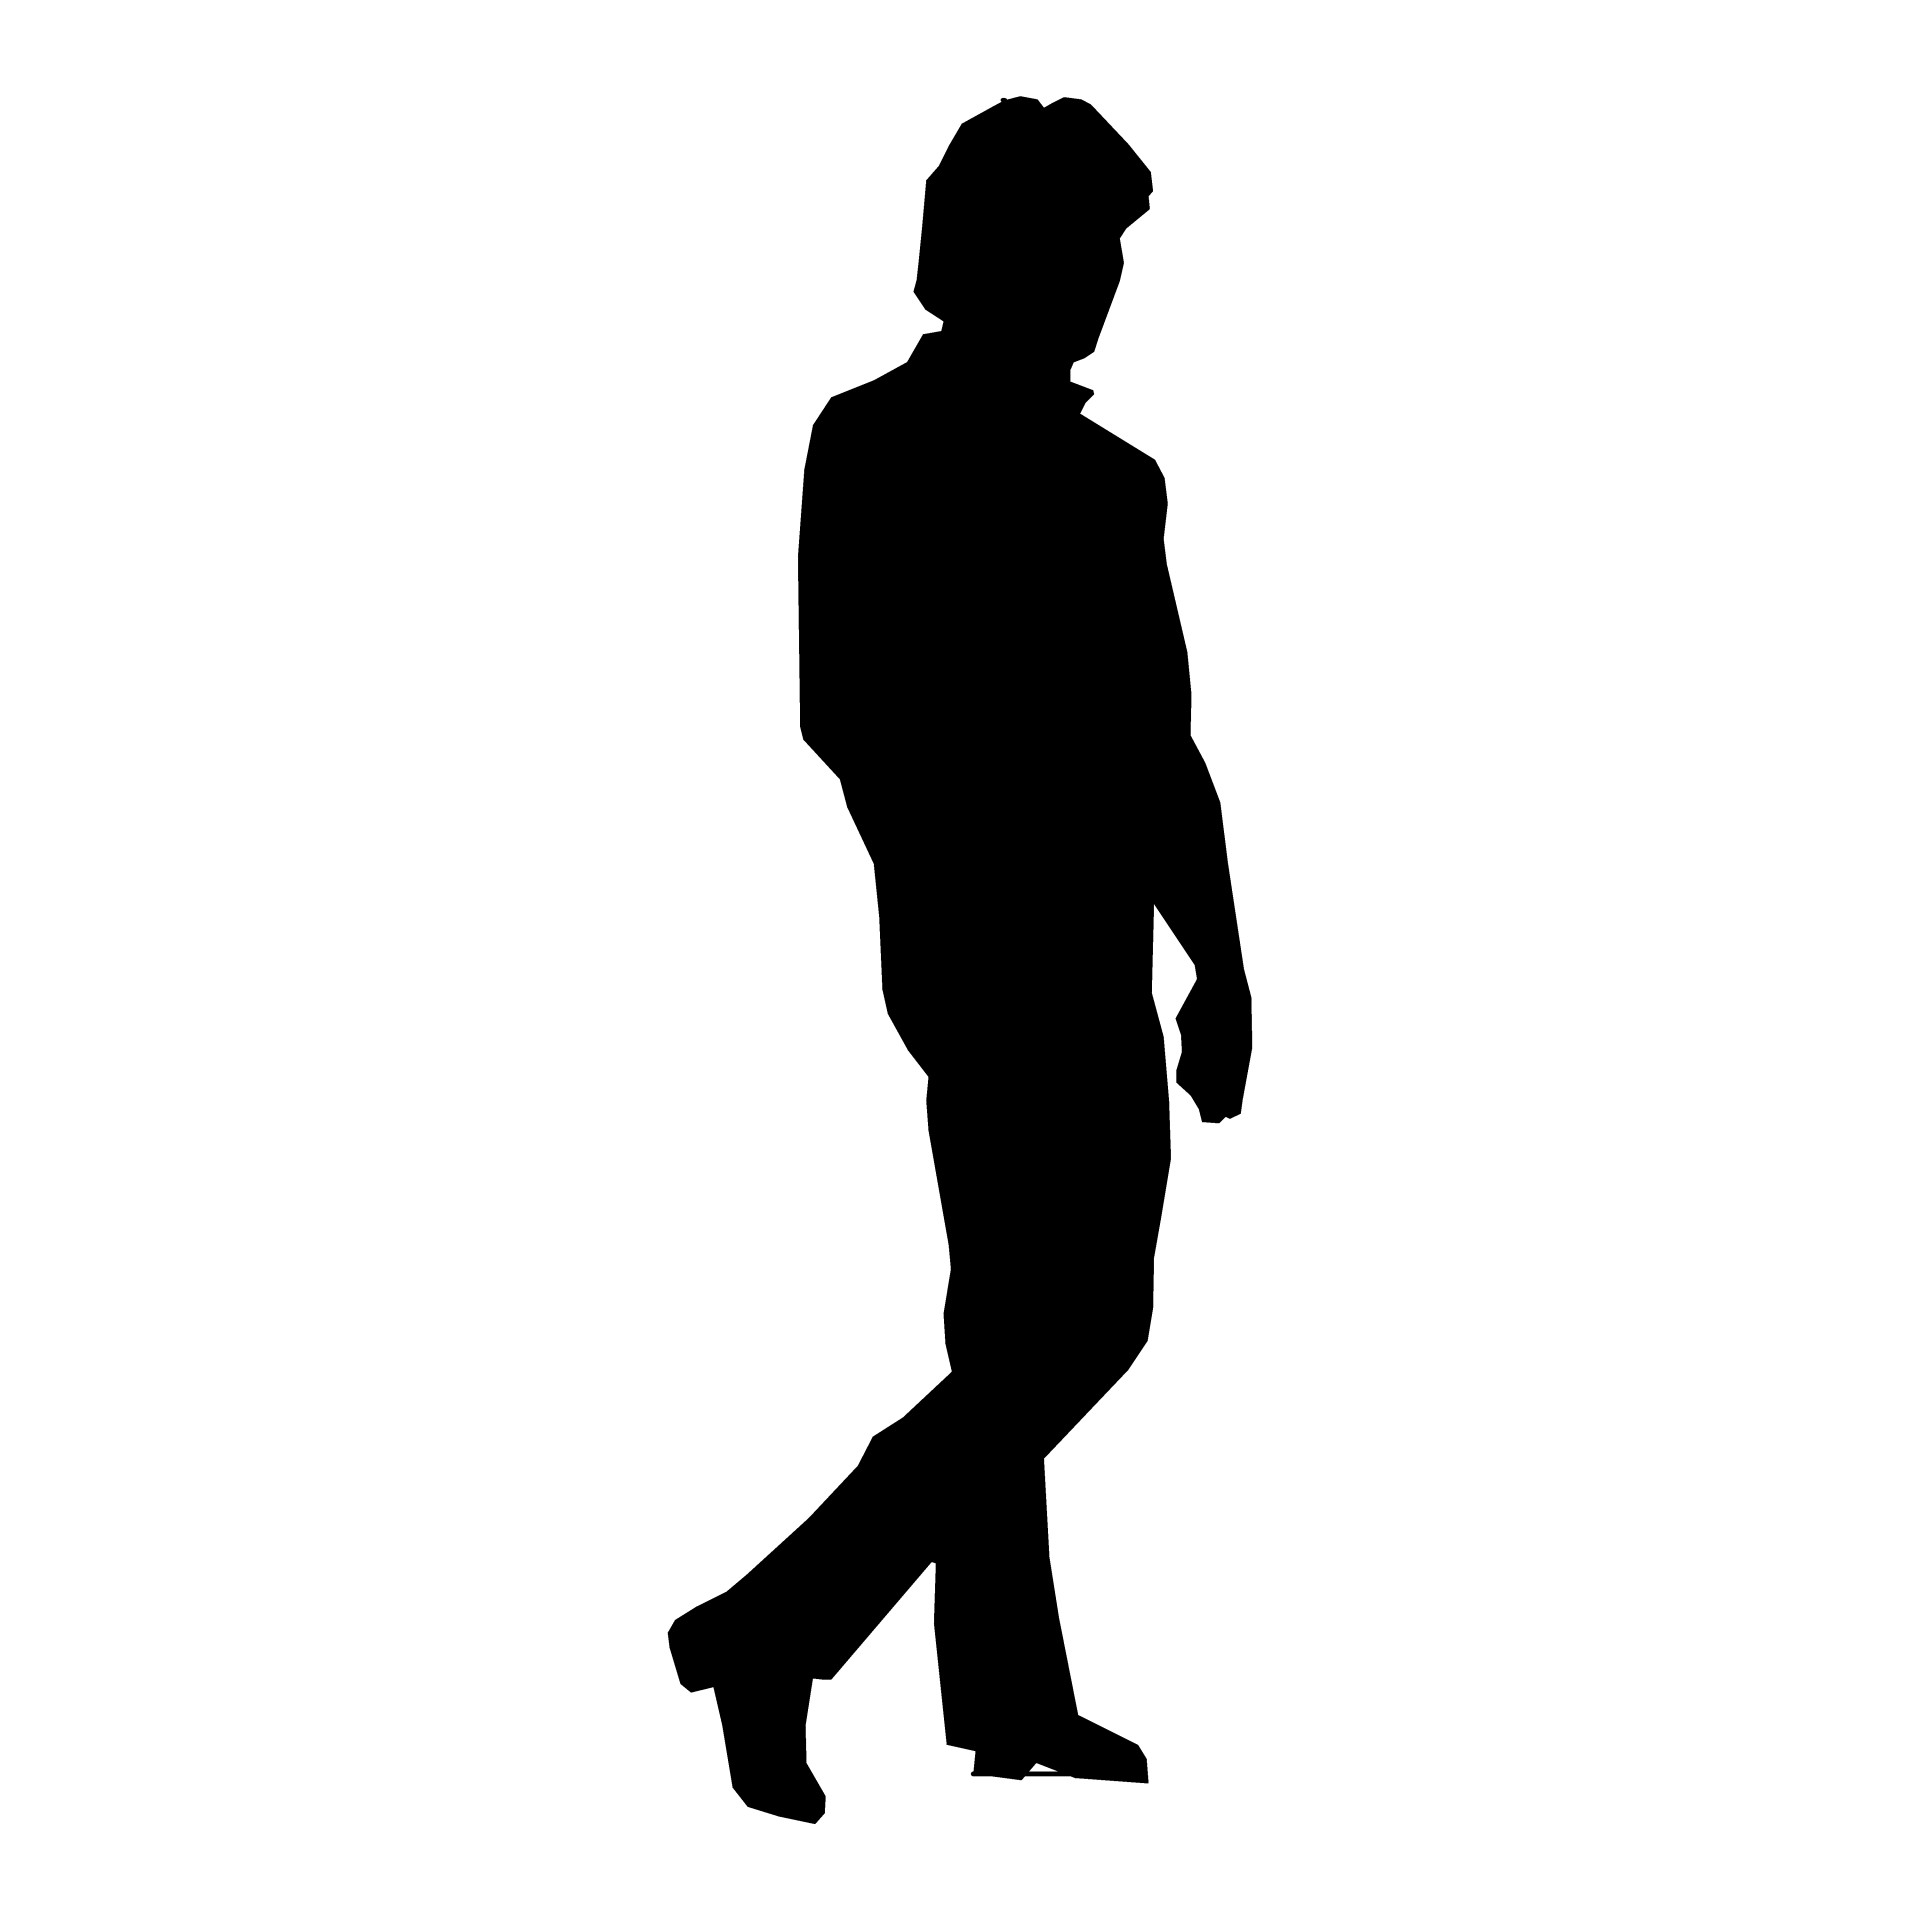 1920x1920 Silhouette Man Walking 4 D Studio Silhouettes